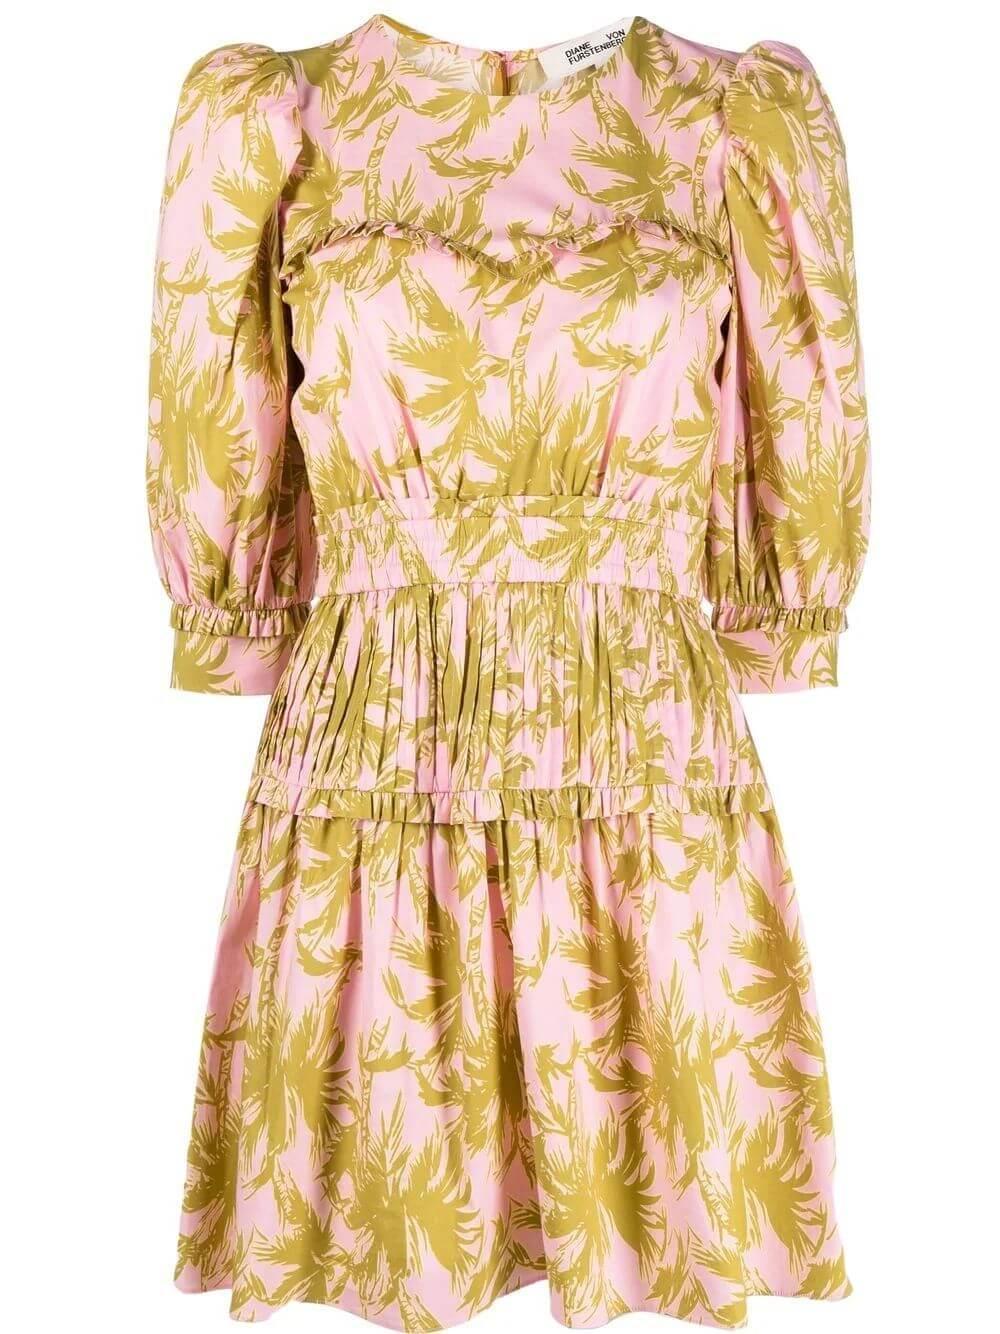 Phoebe Palm Printed Dress